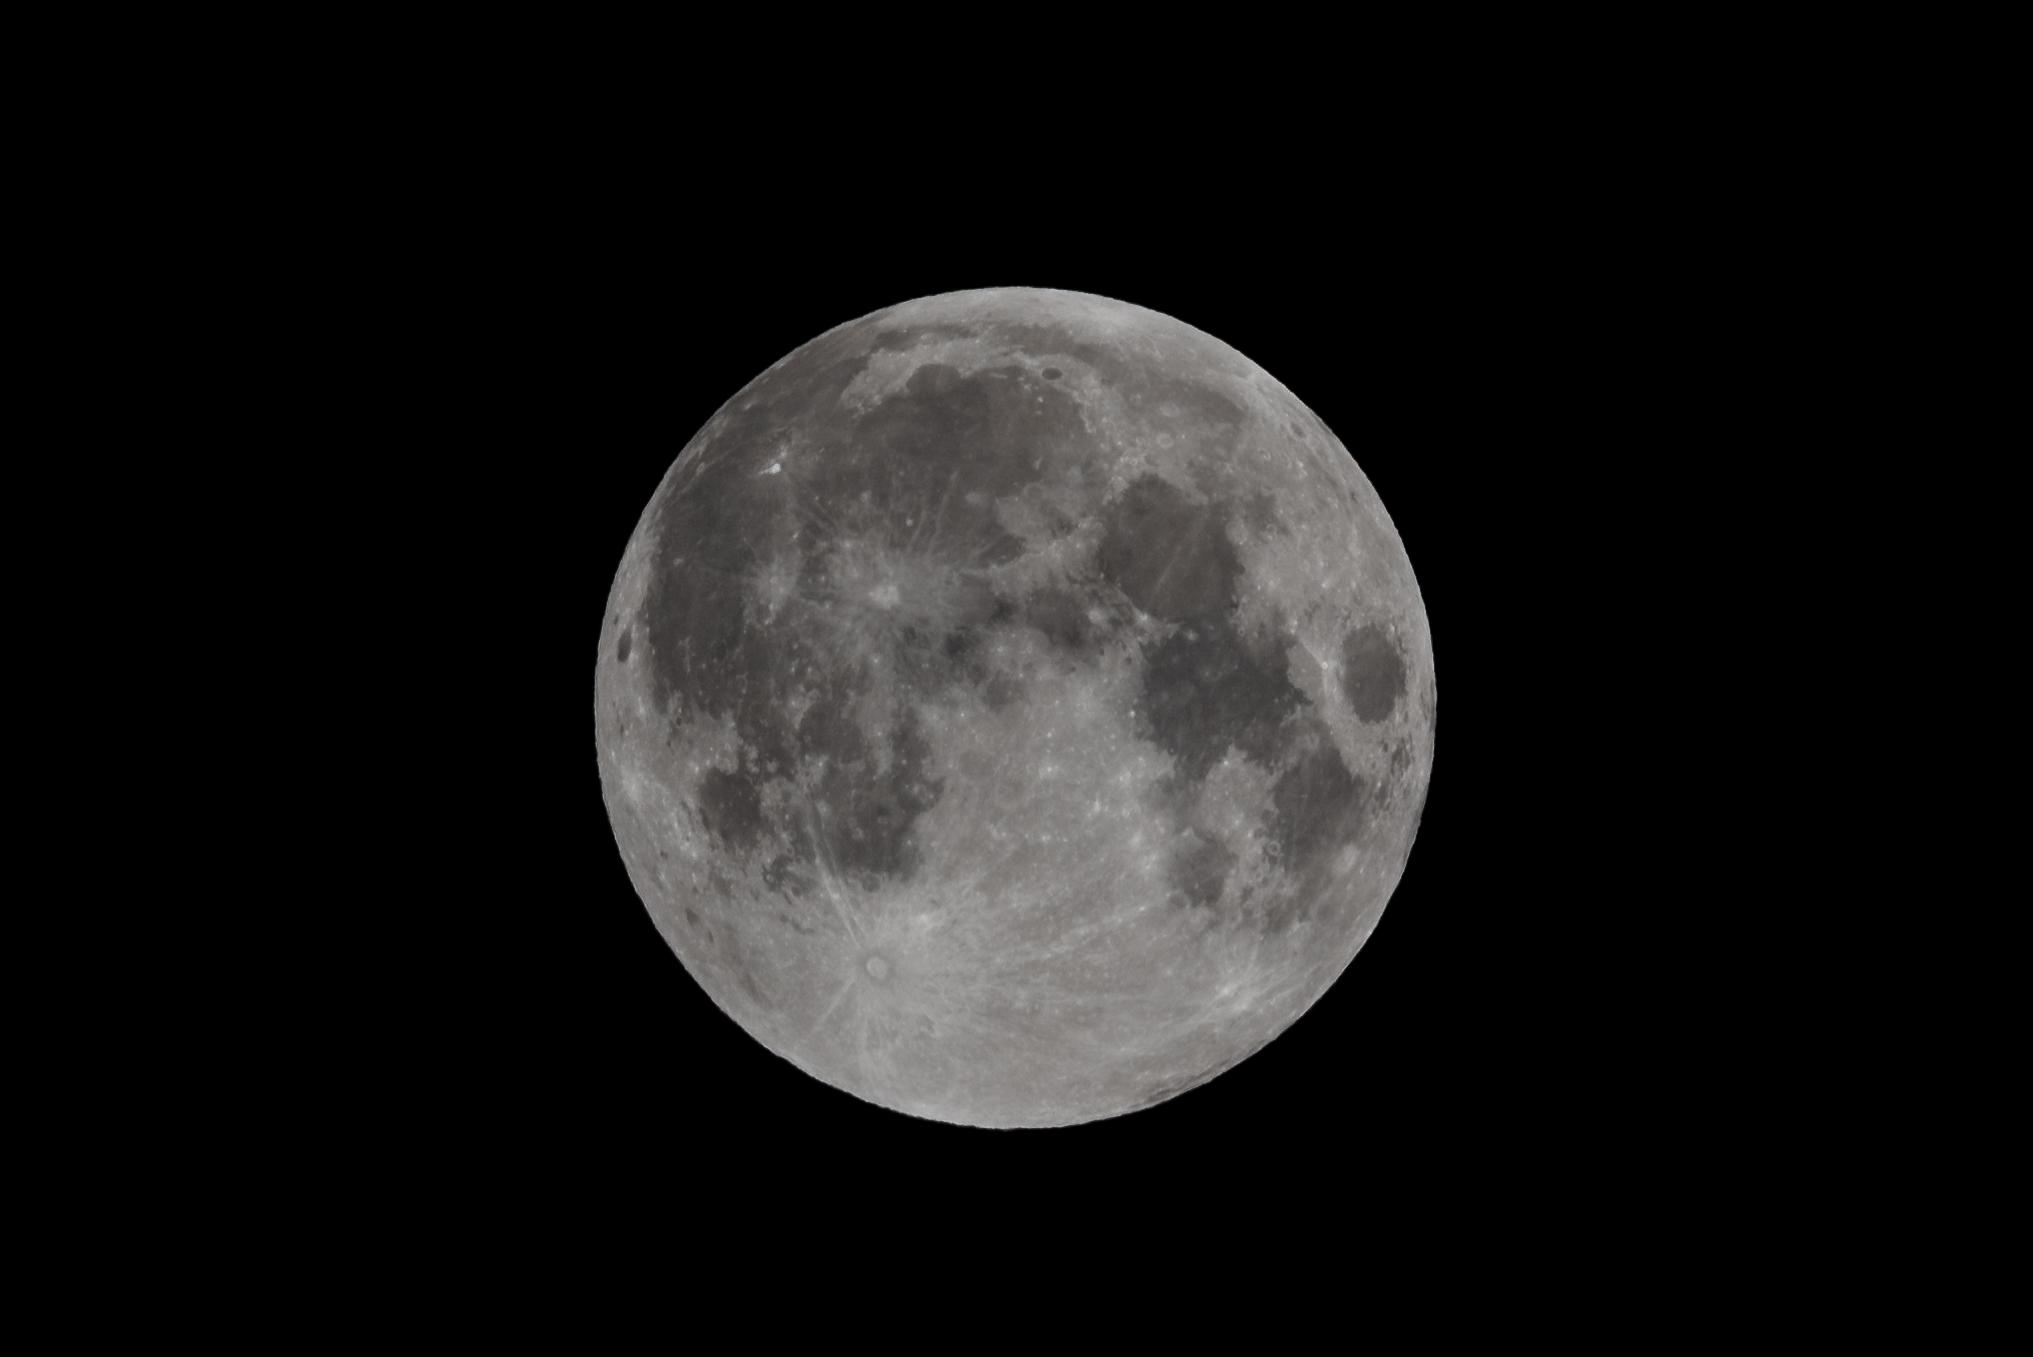 Full Moon 23 March 2016  Nikon D750 ISO 100 600mm f/14 1/250 sec.